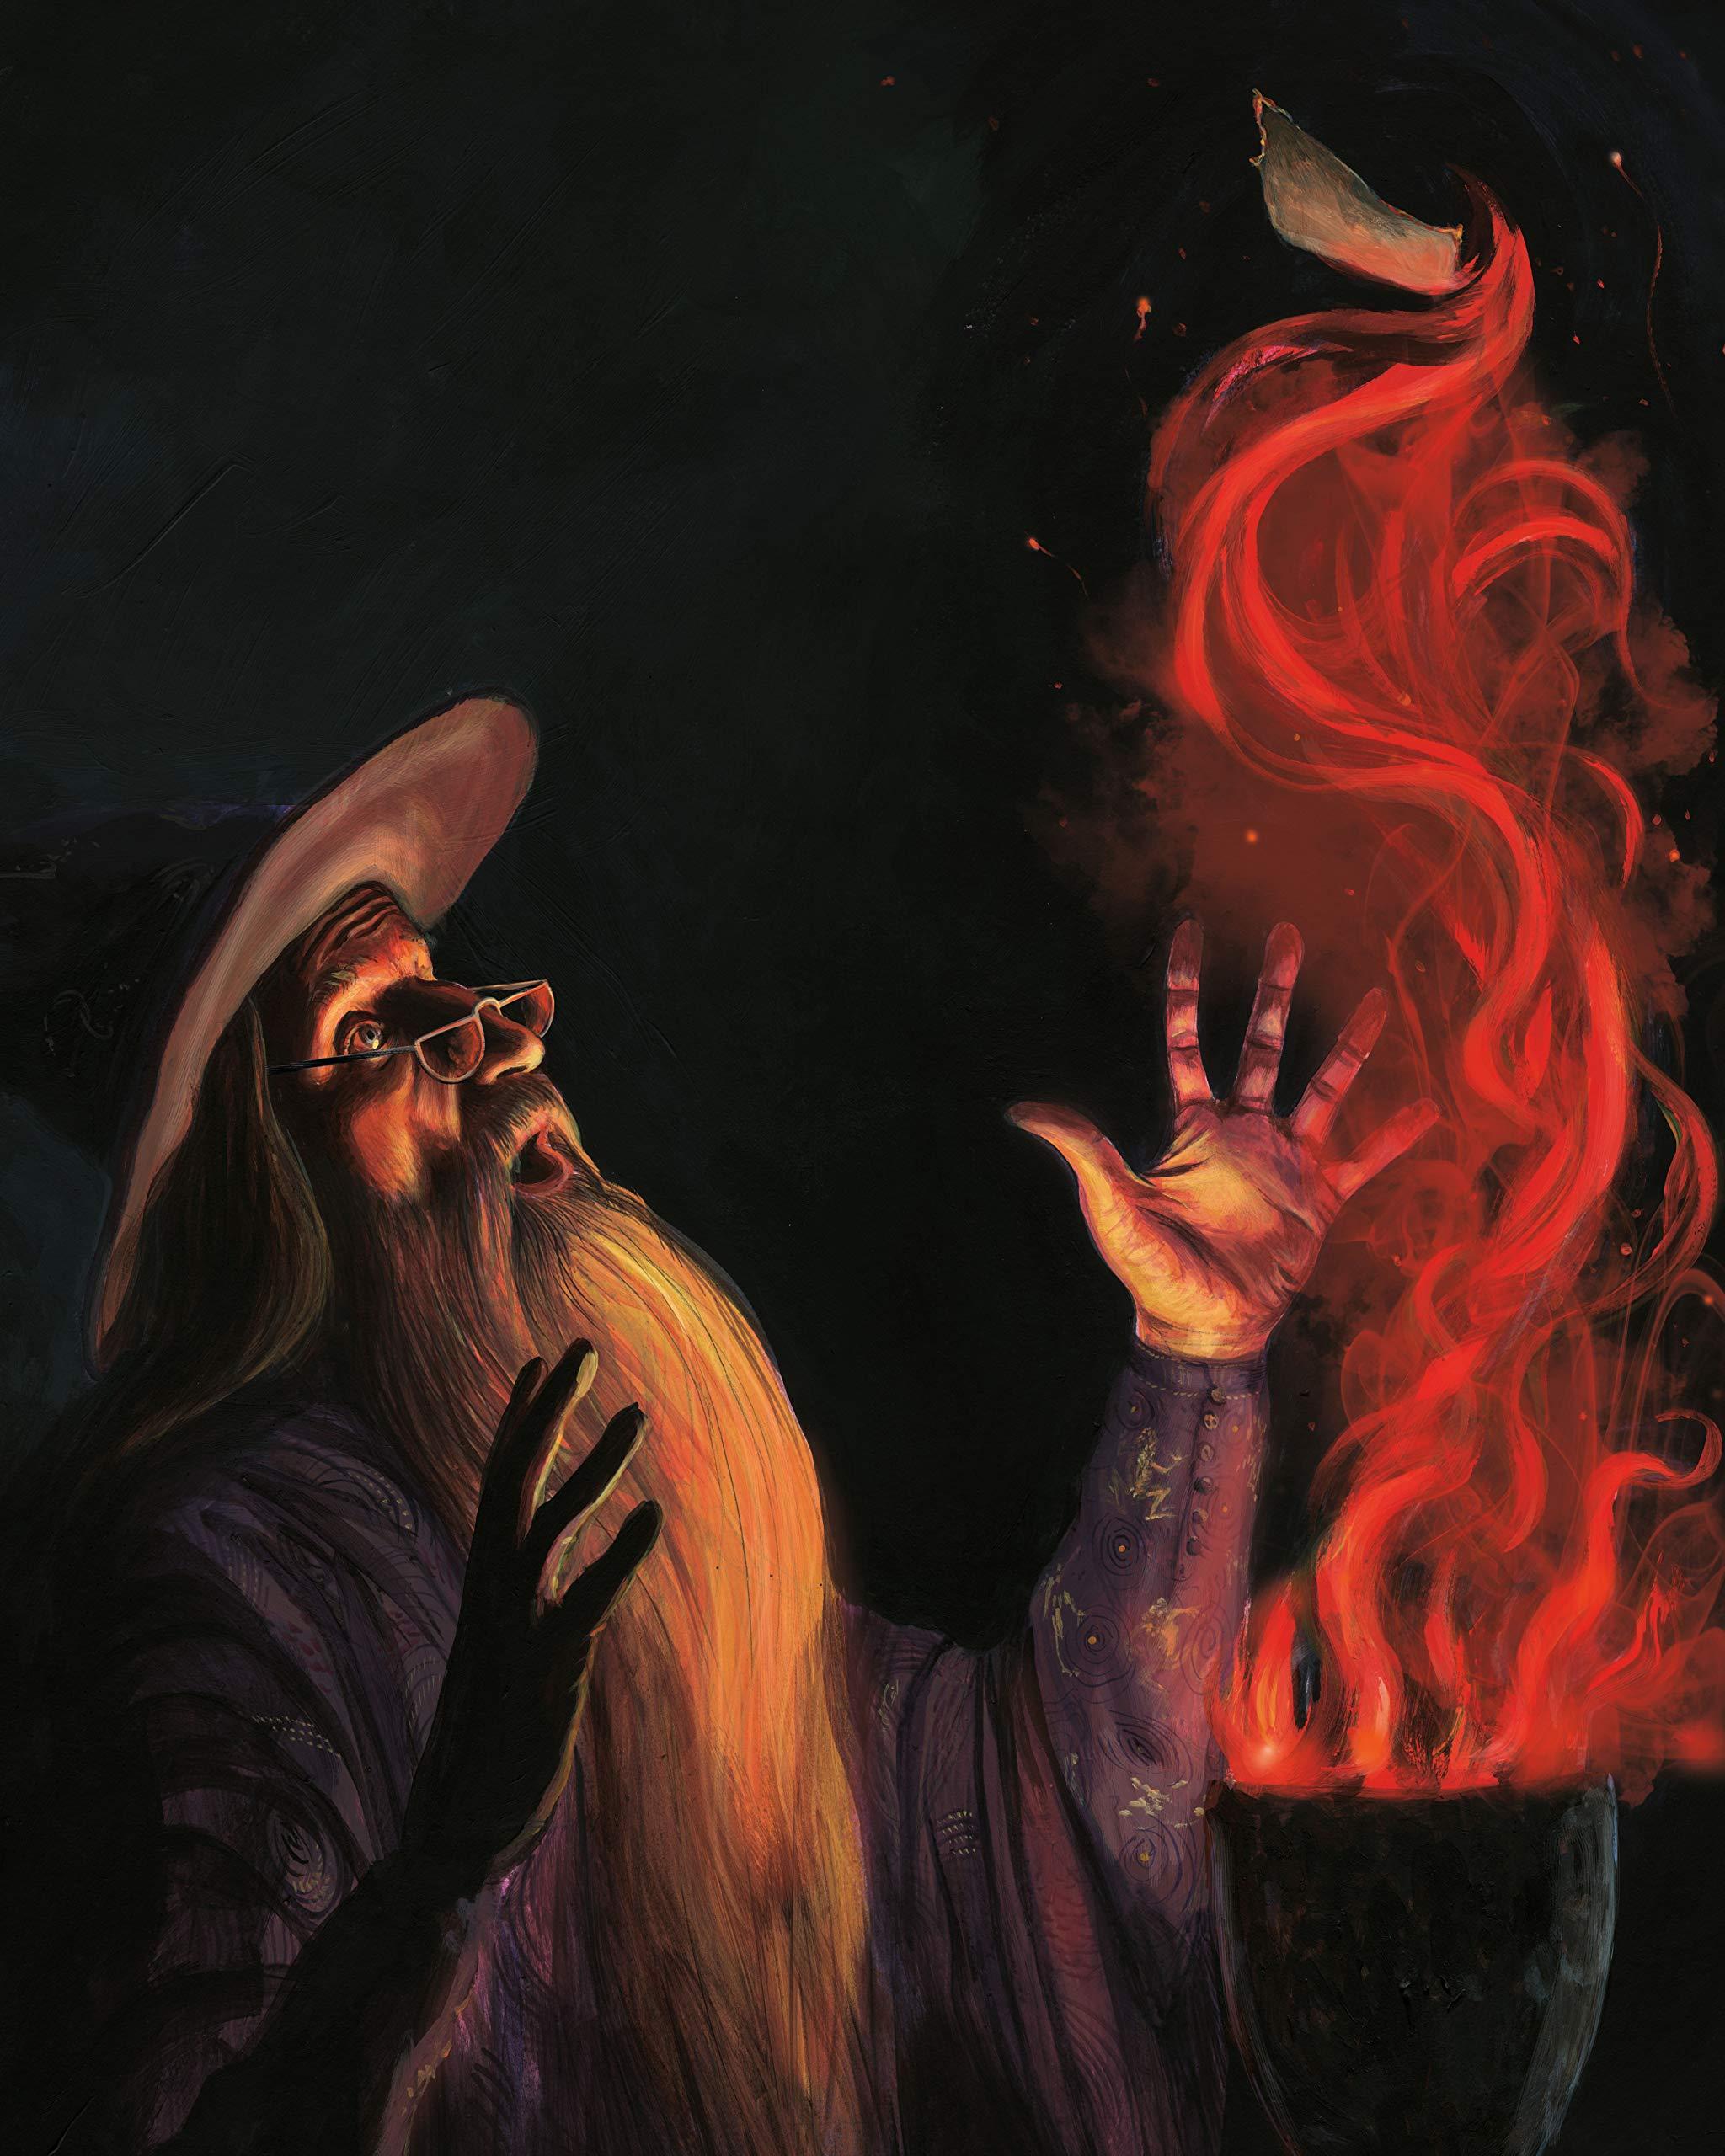 JimKay-Illustration B4C16 DumbledoreGoblet.jpg